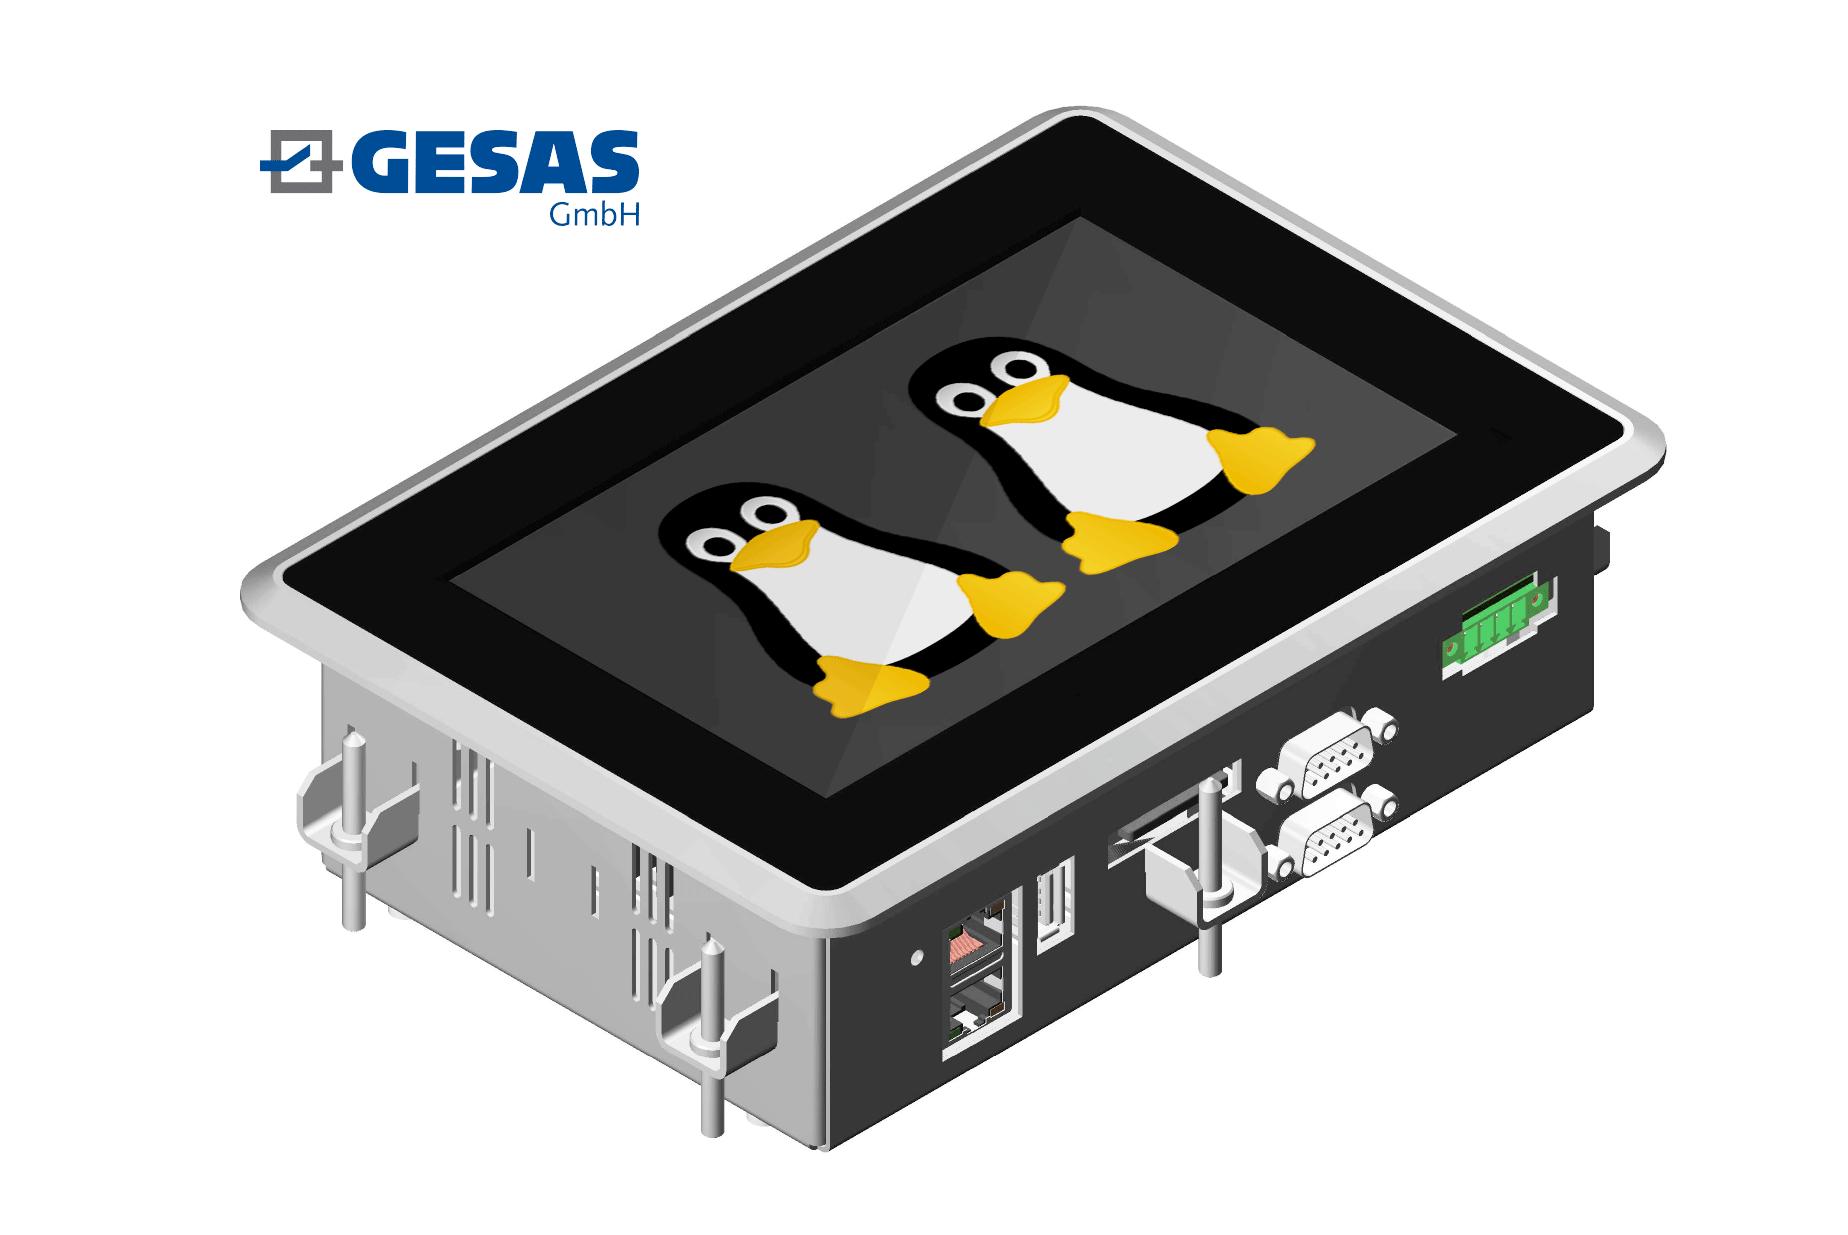 HMI Panel GESAS GmbH